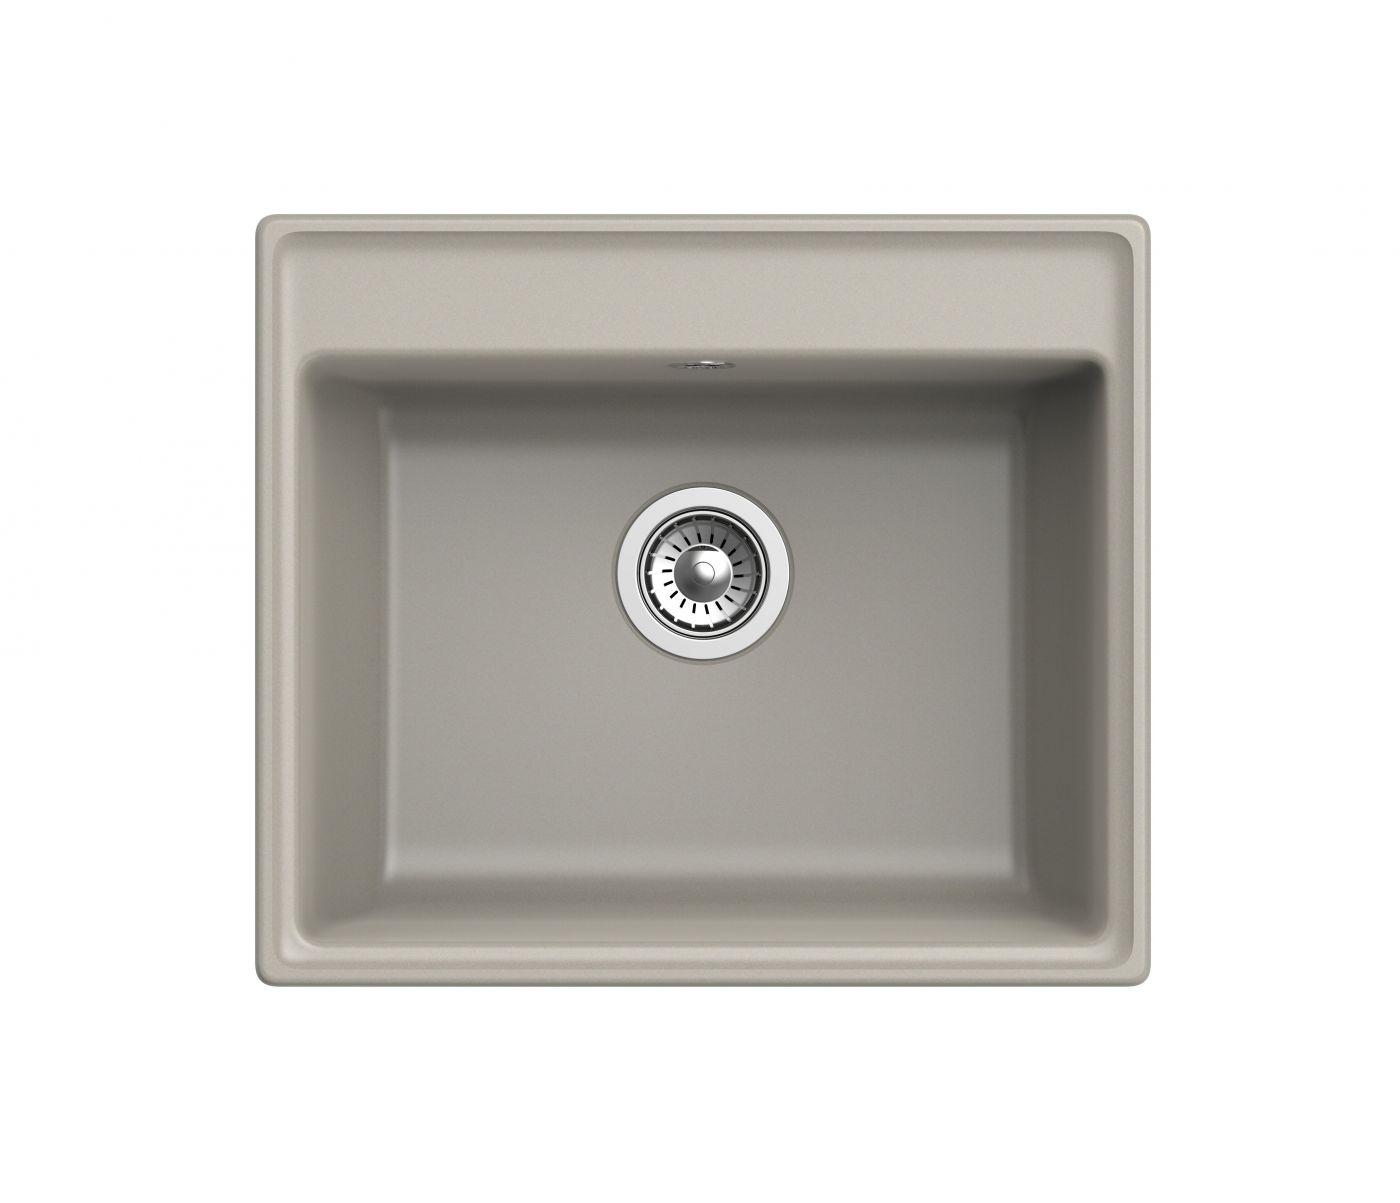 Мраморная мойка для кухни GranFest Vertex GF-V580 Топаз